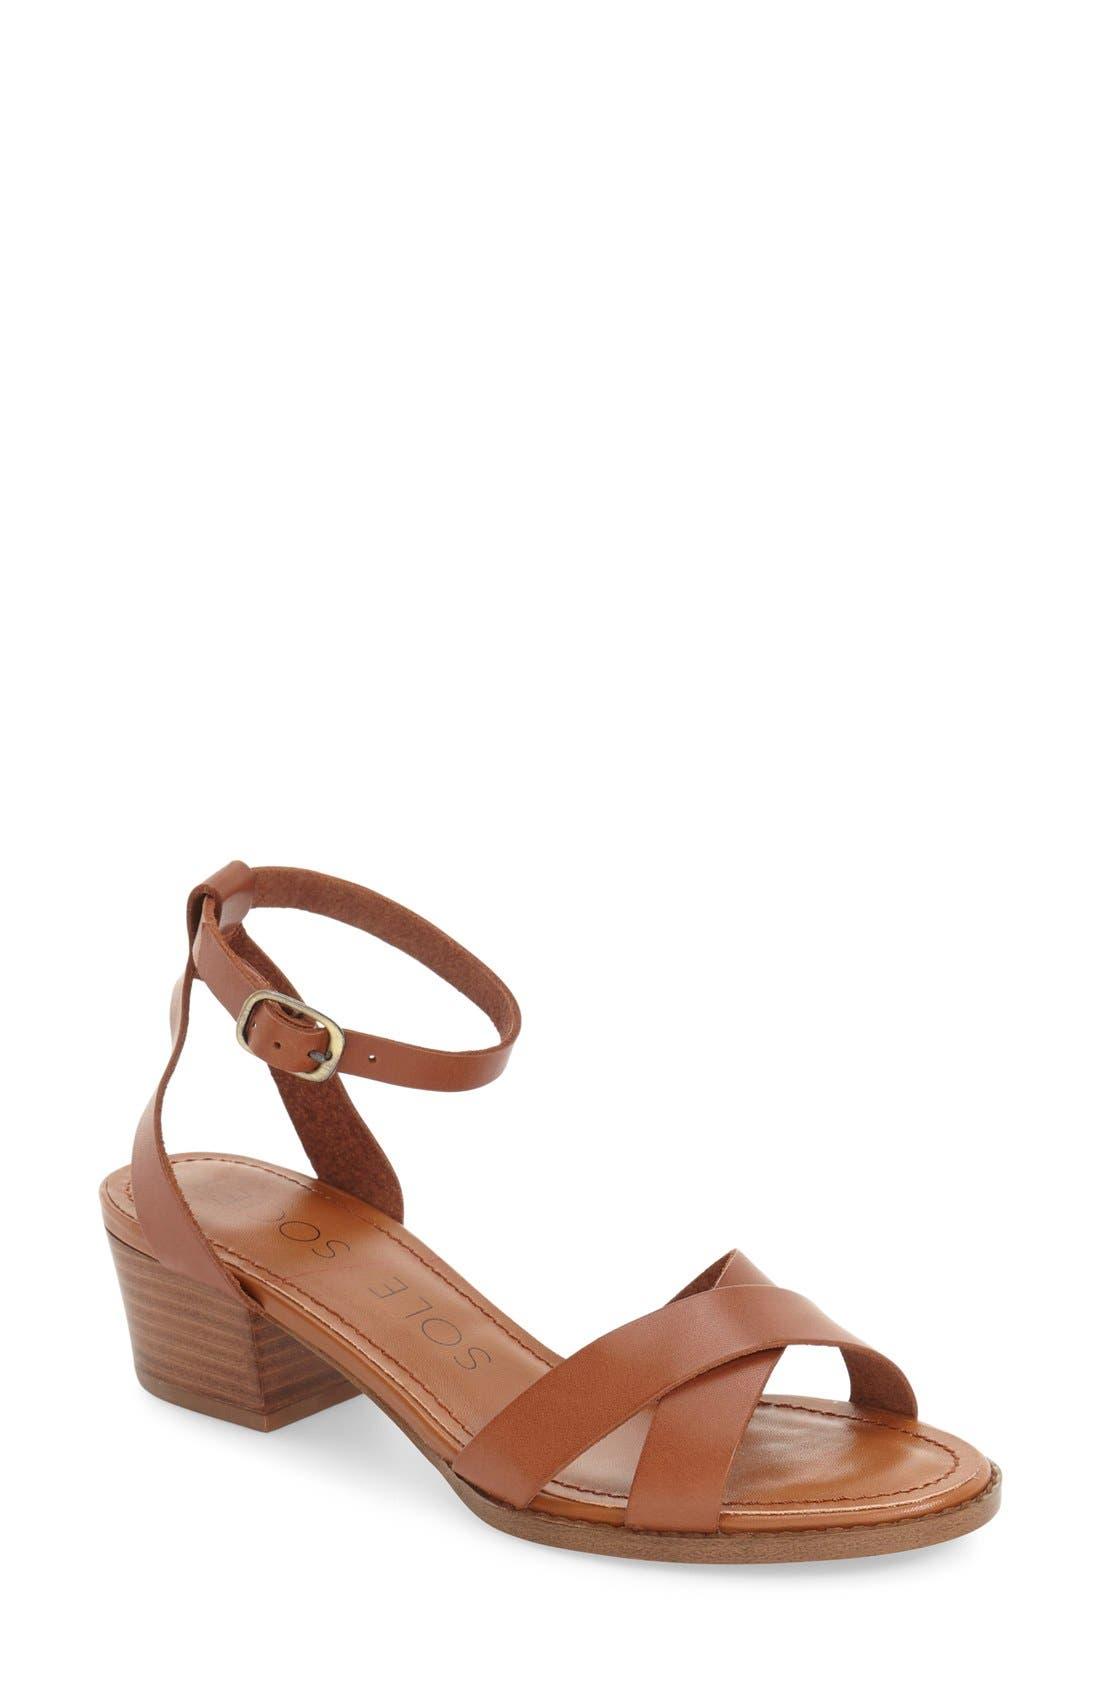 Alternate Image 1 Selected - Sole Society 'Savannah' Sandal (Women)